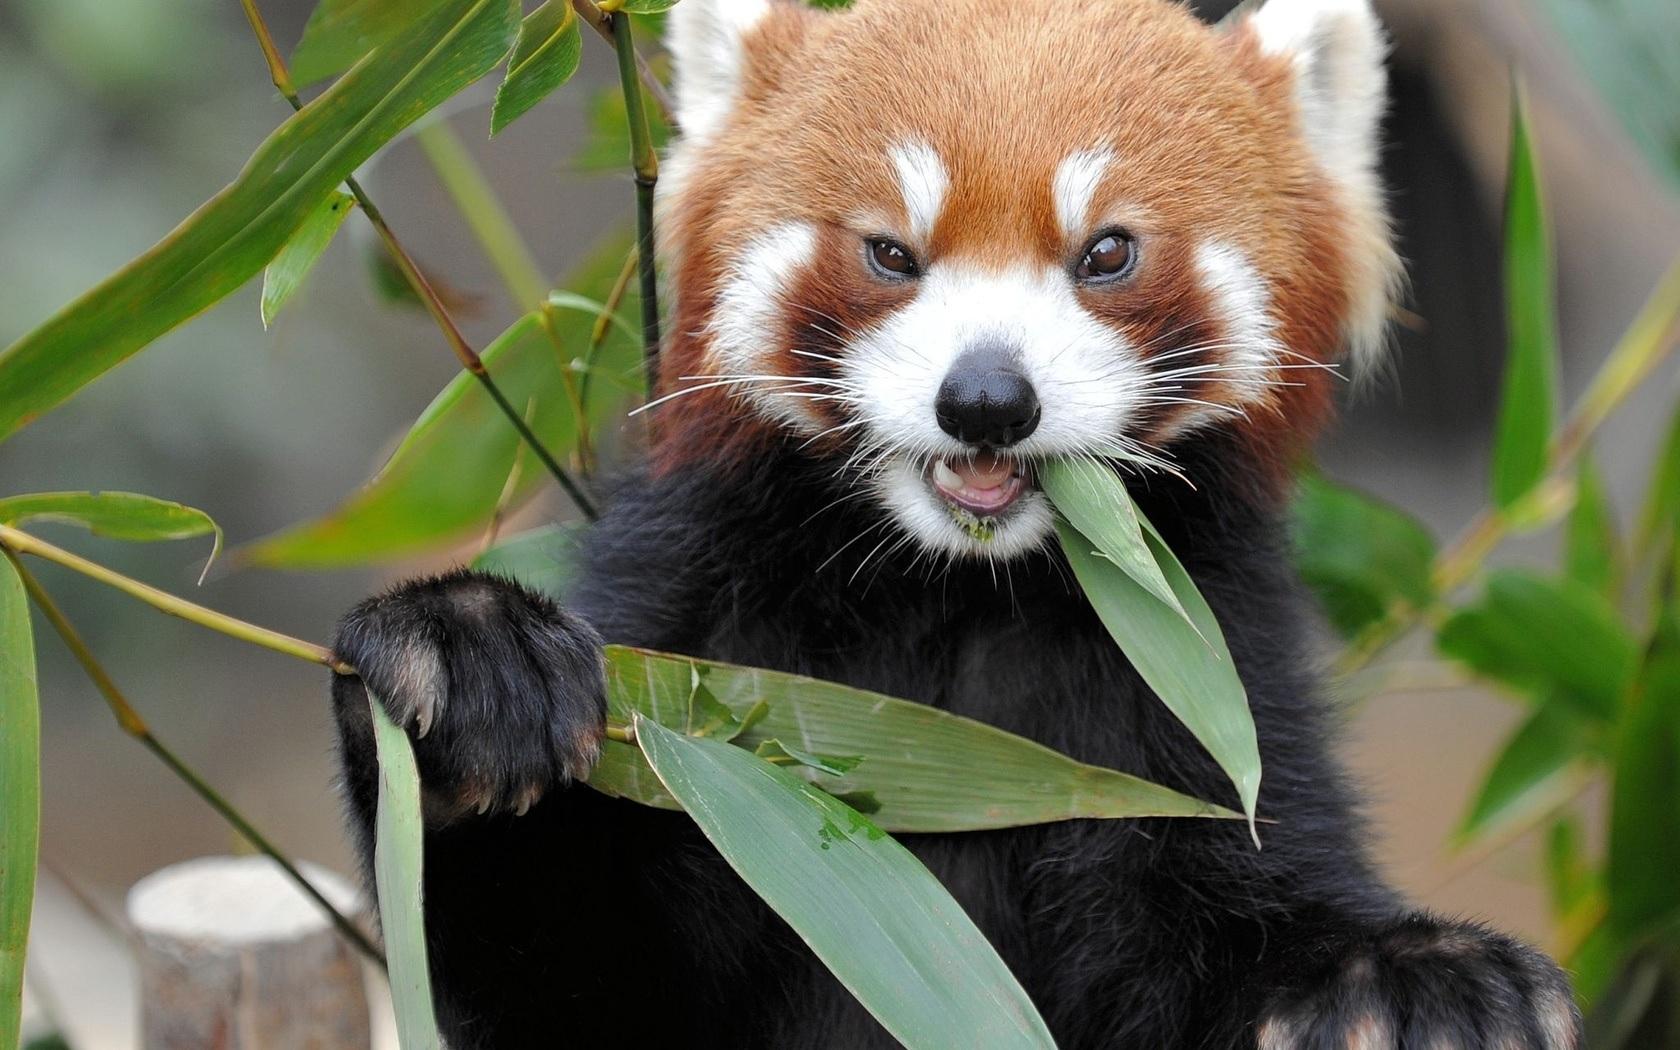 Fotos, Características Y Oso Panda Gigante